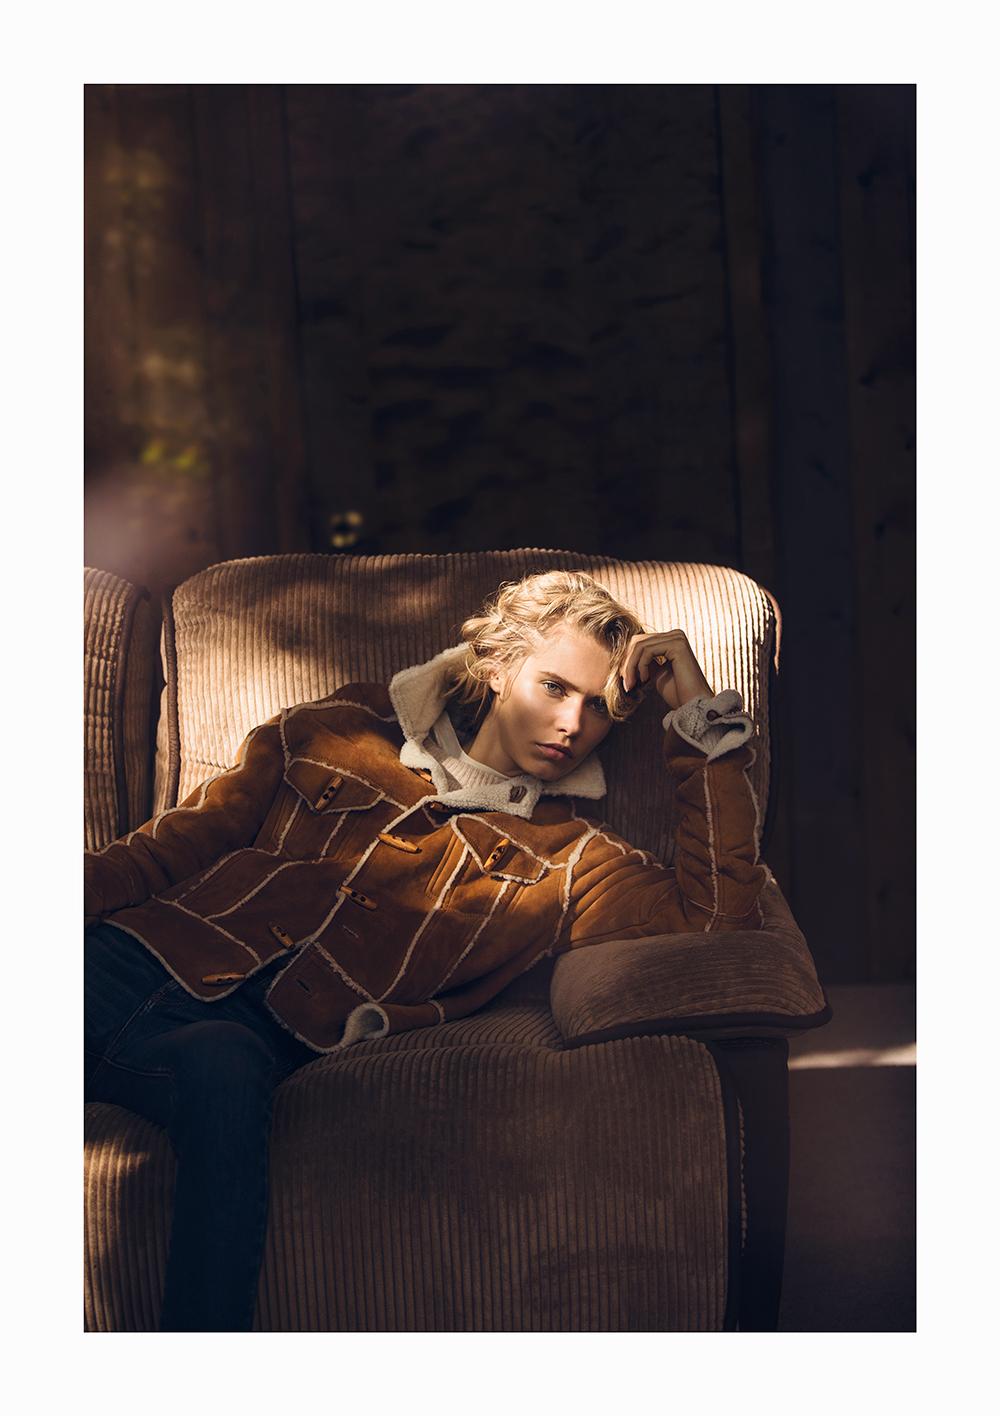 Vogue_Arabia_SiljaMagg04.jpg